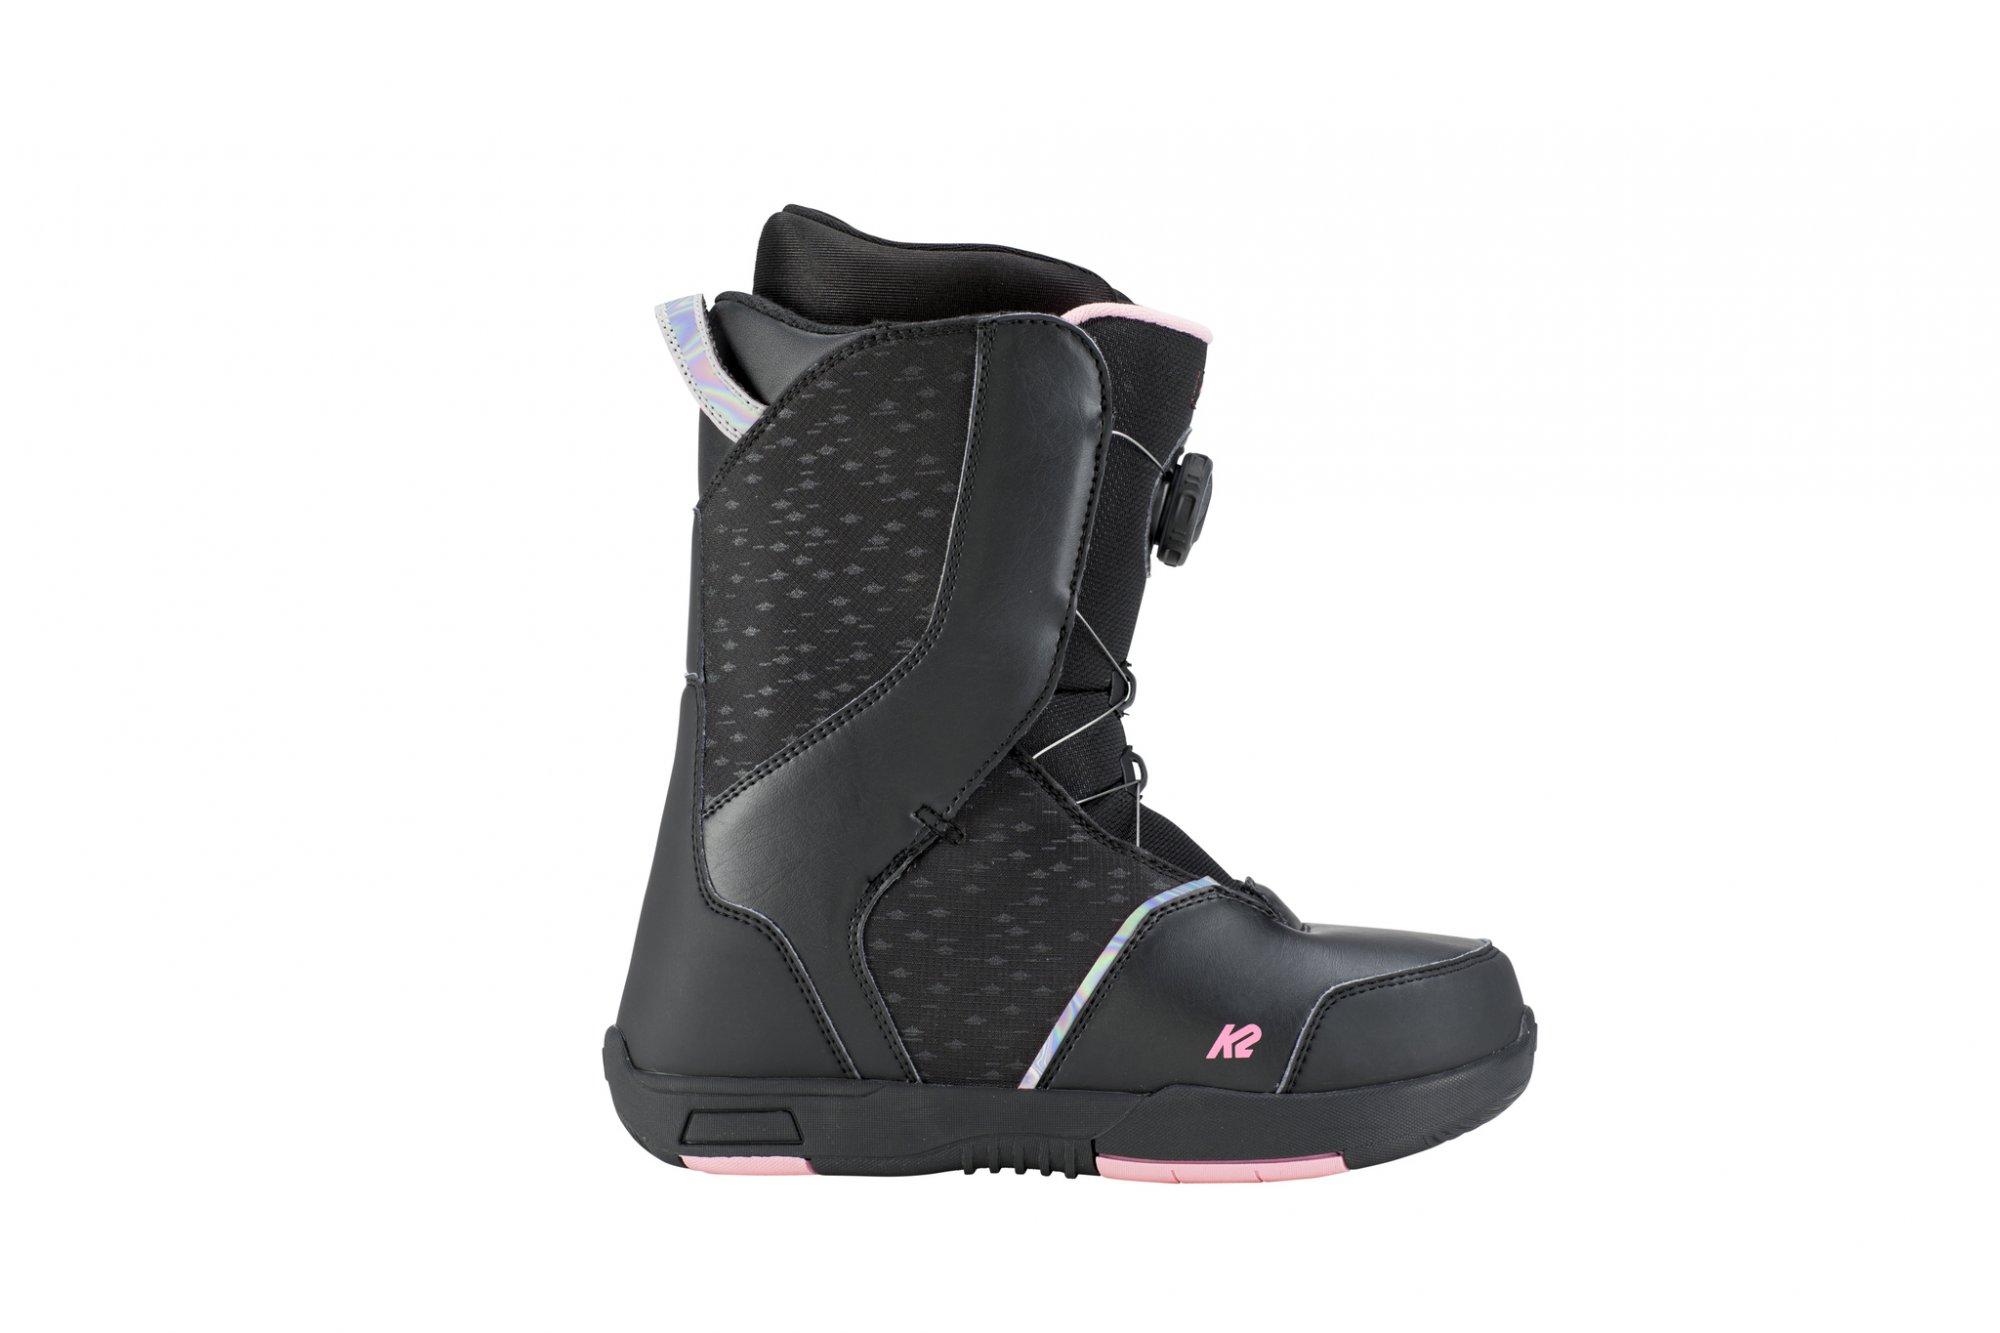 2019 K2 Kat Snowboard Boots